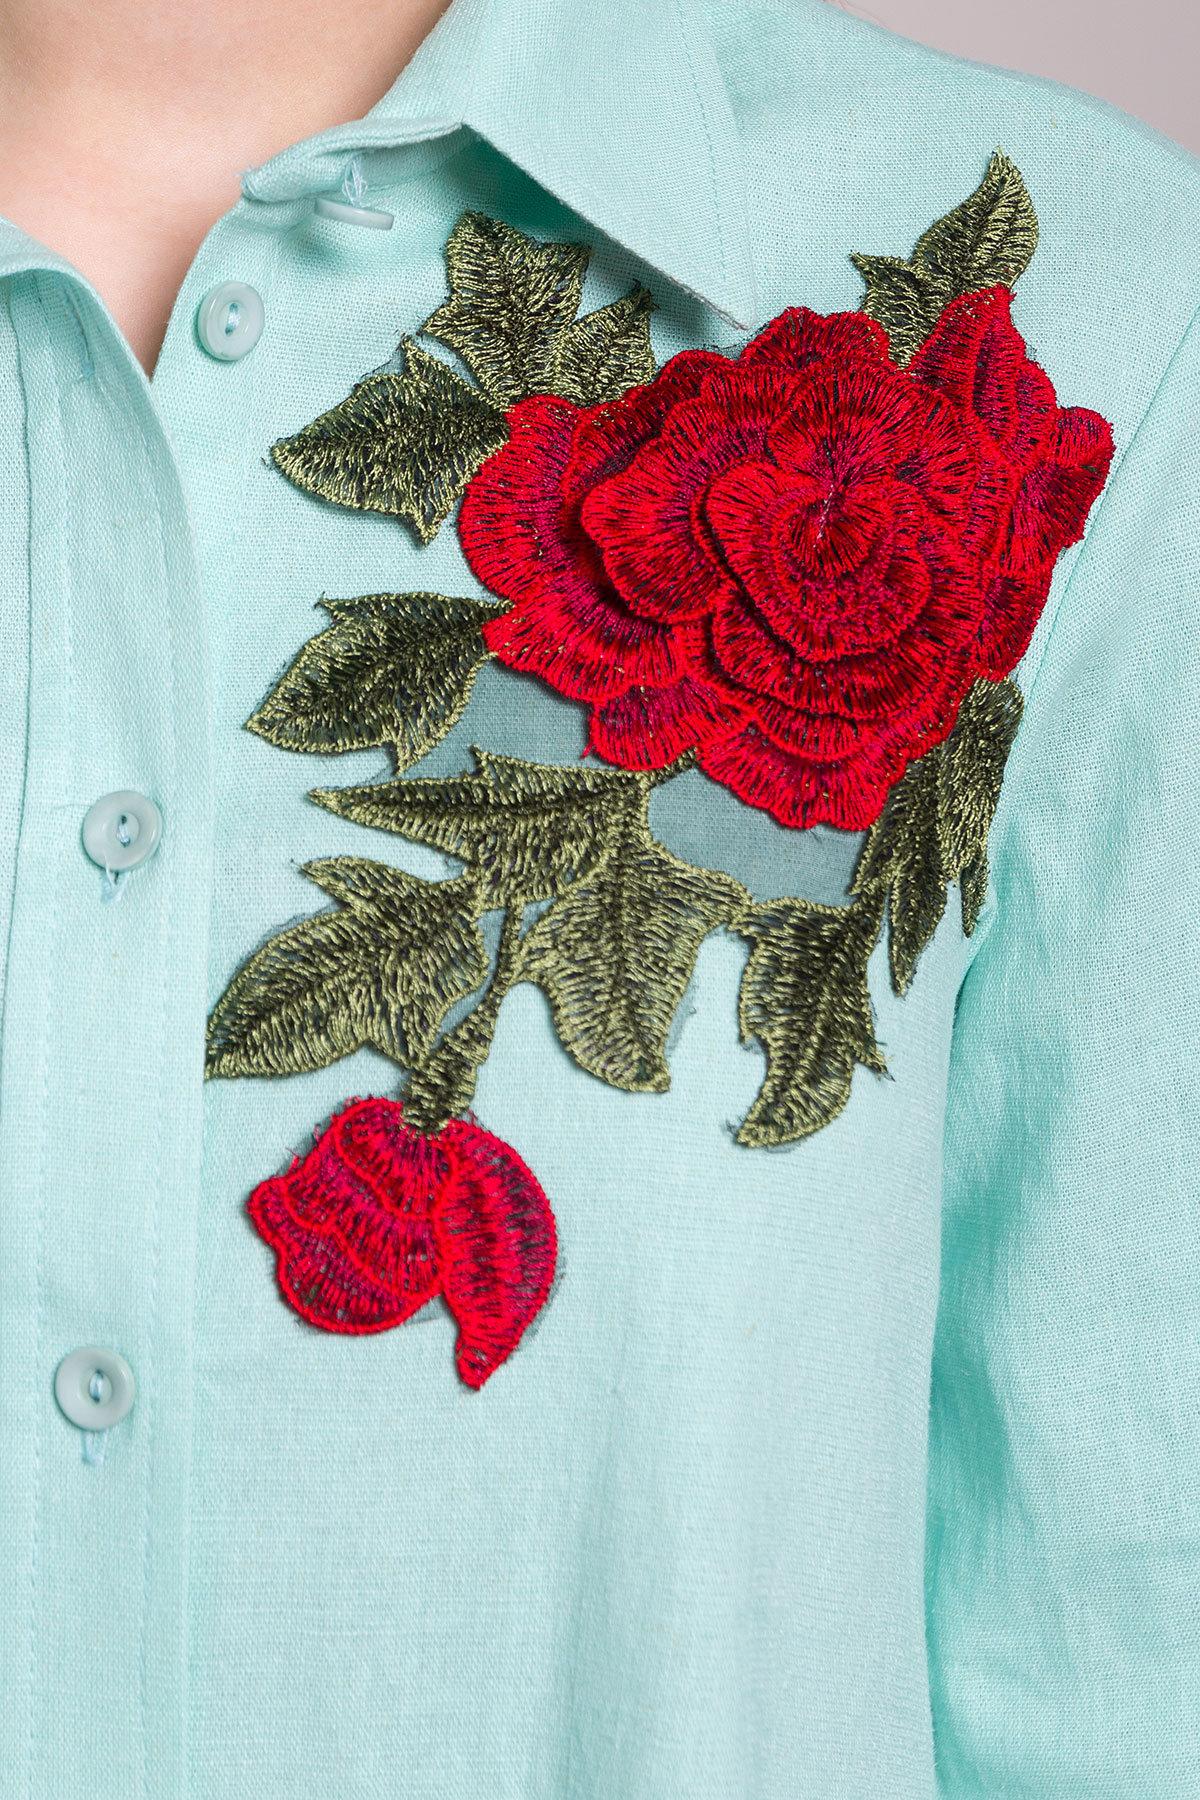 Платье Бри 2706 АРТ. 34088 Цвет: Мята - фото 5, интернет магазин tm-modus.ru